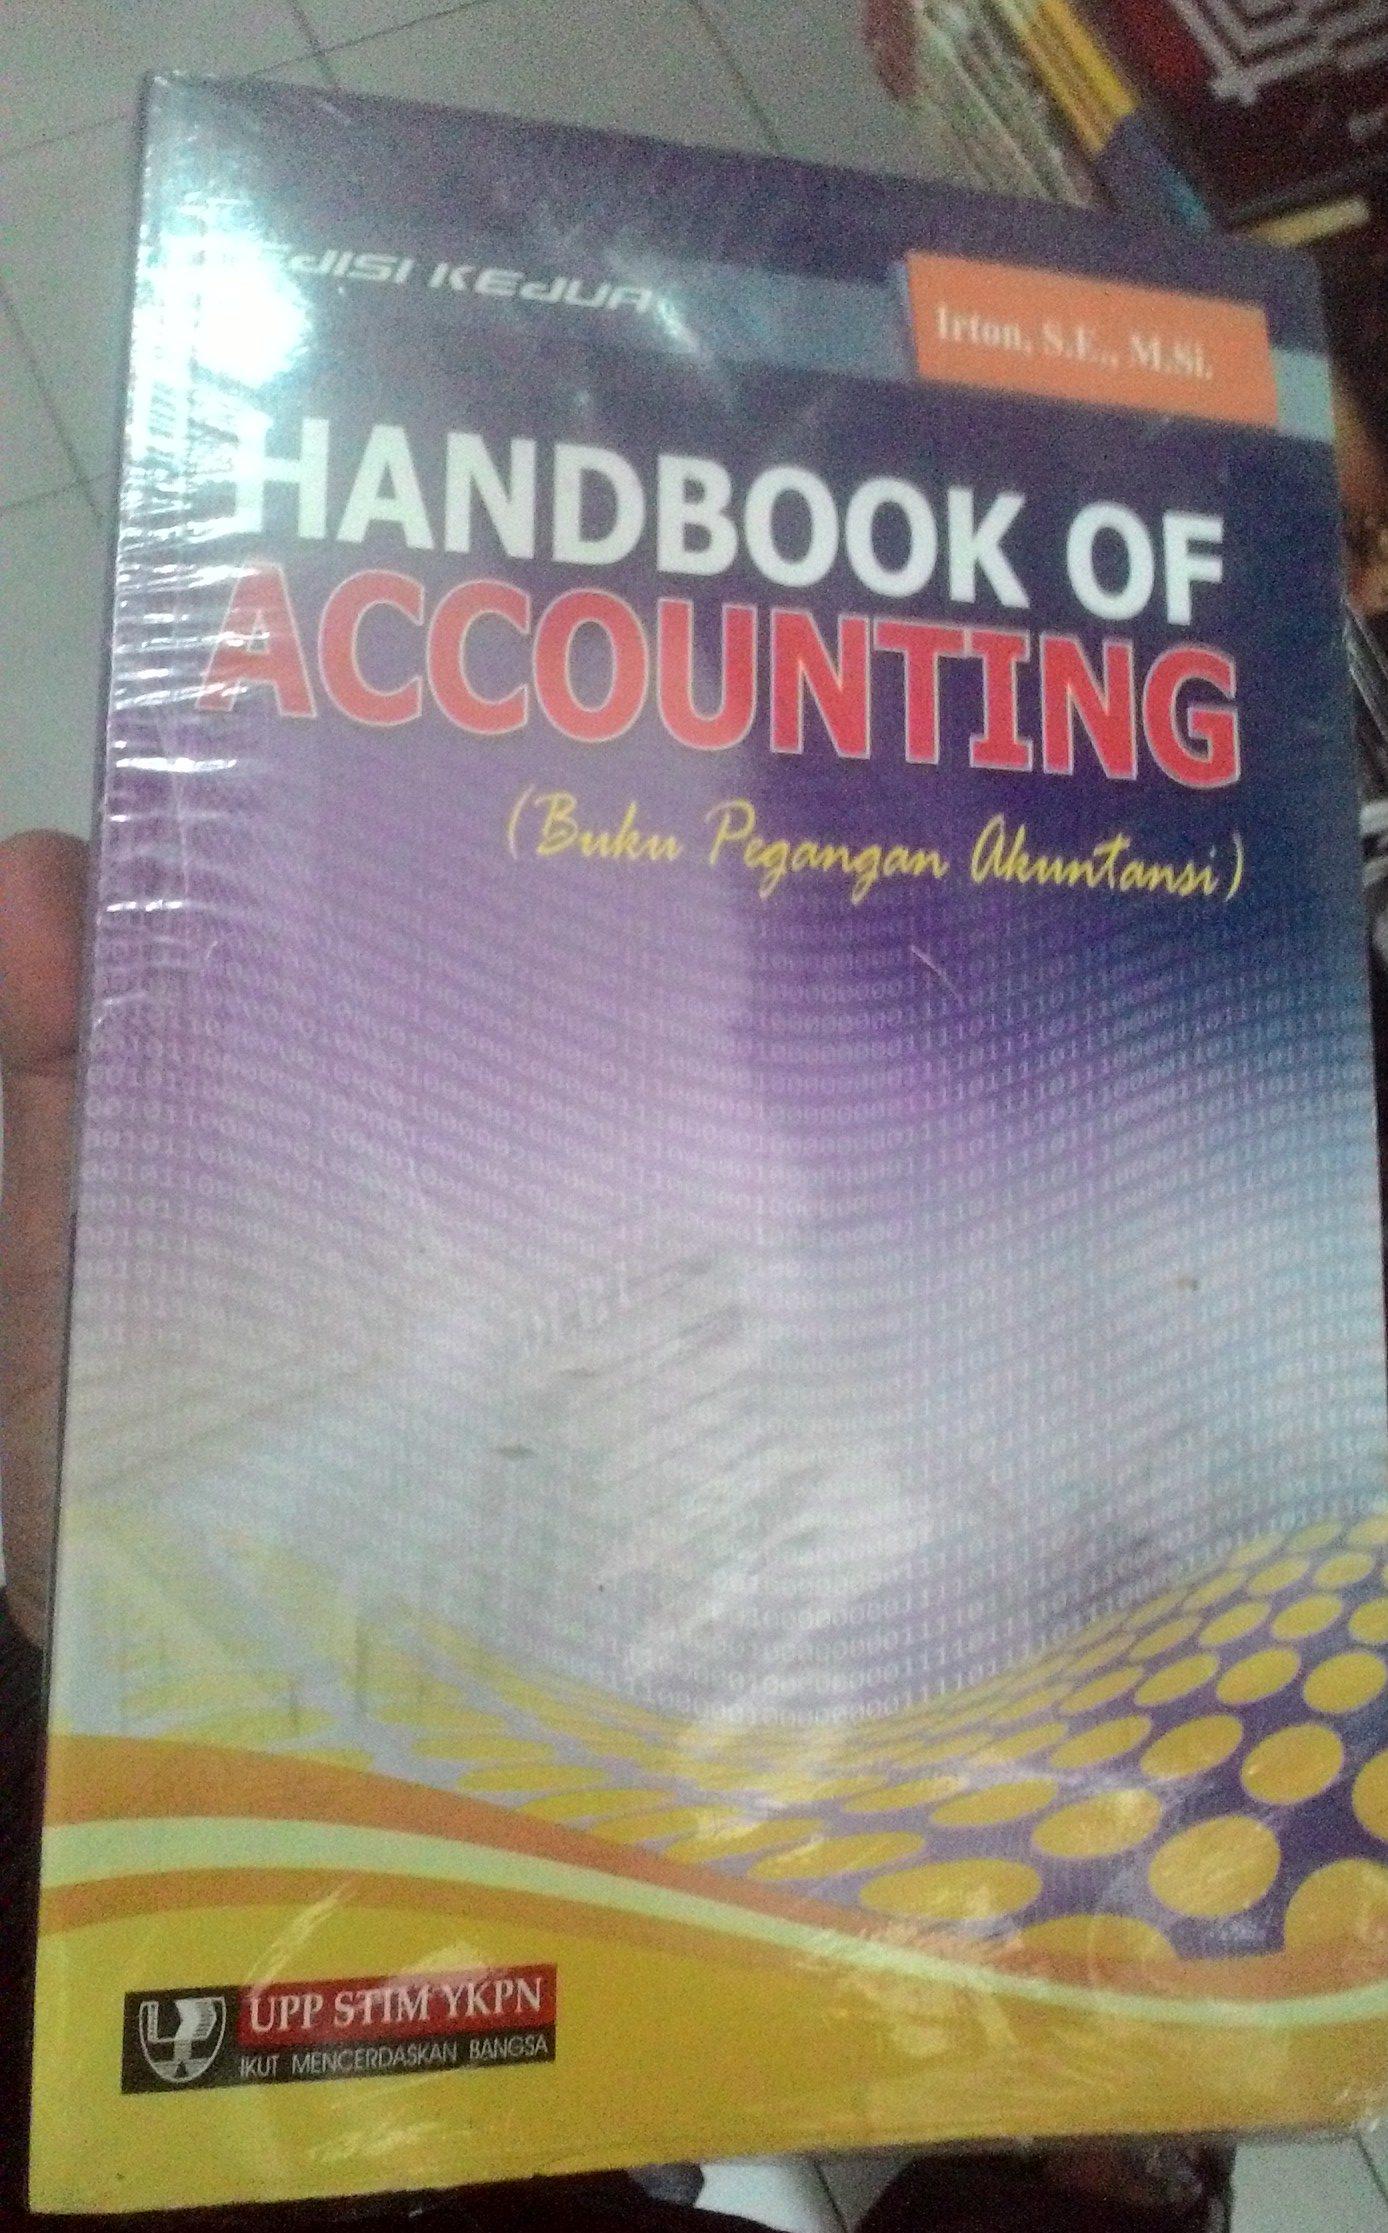 Handbook Of Accounting Buku Pegangan Akuntansi Jual